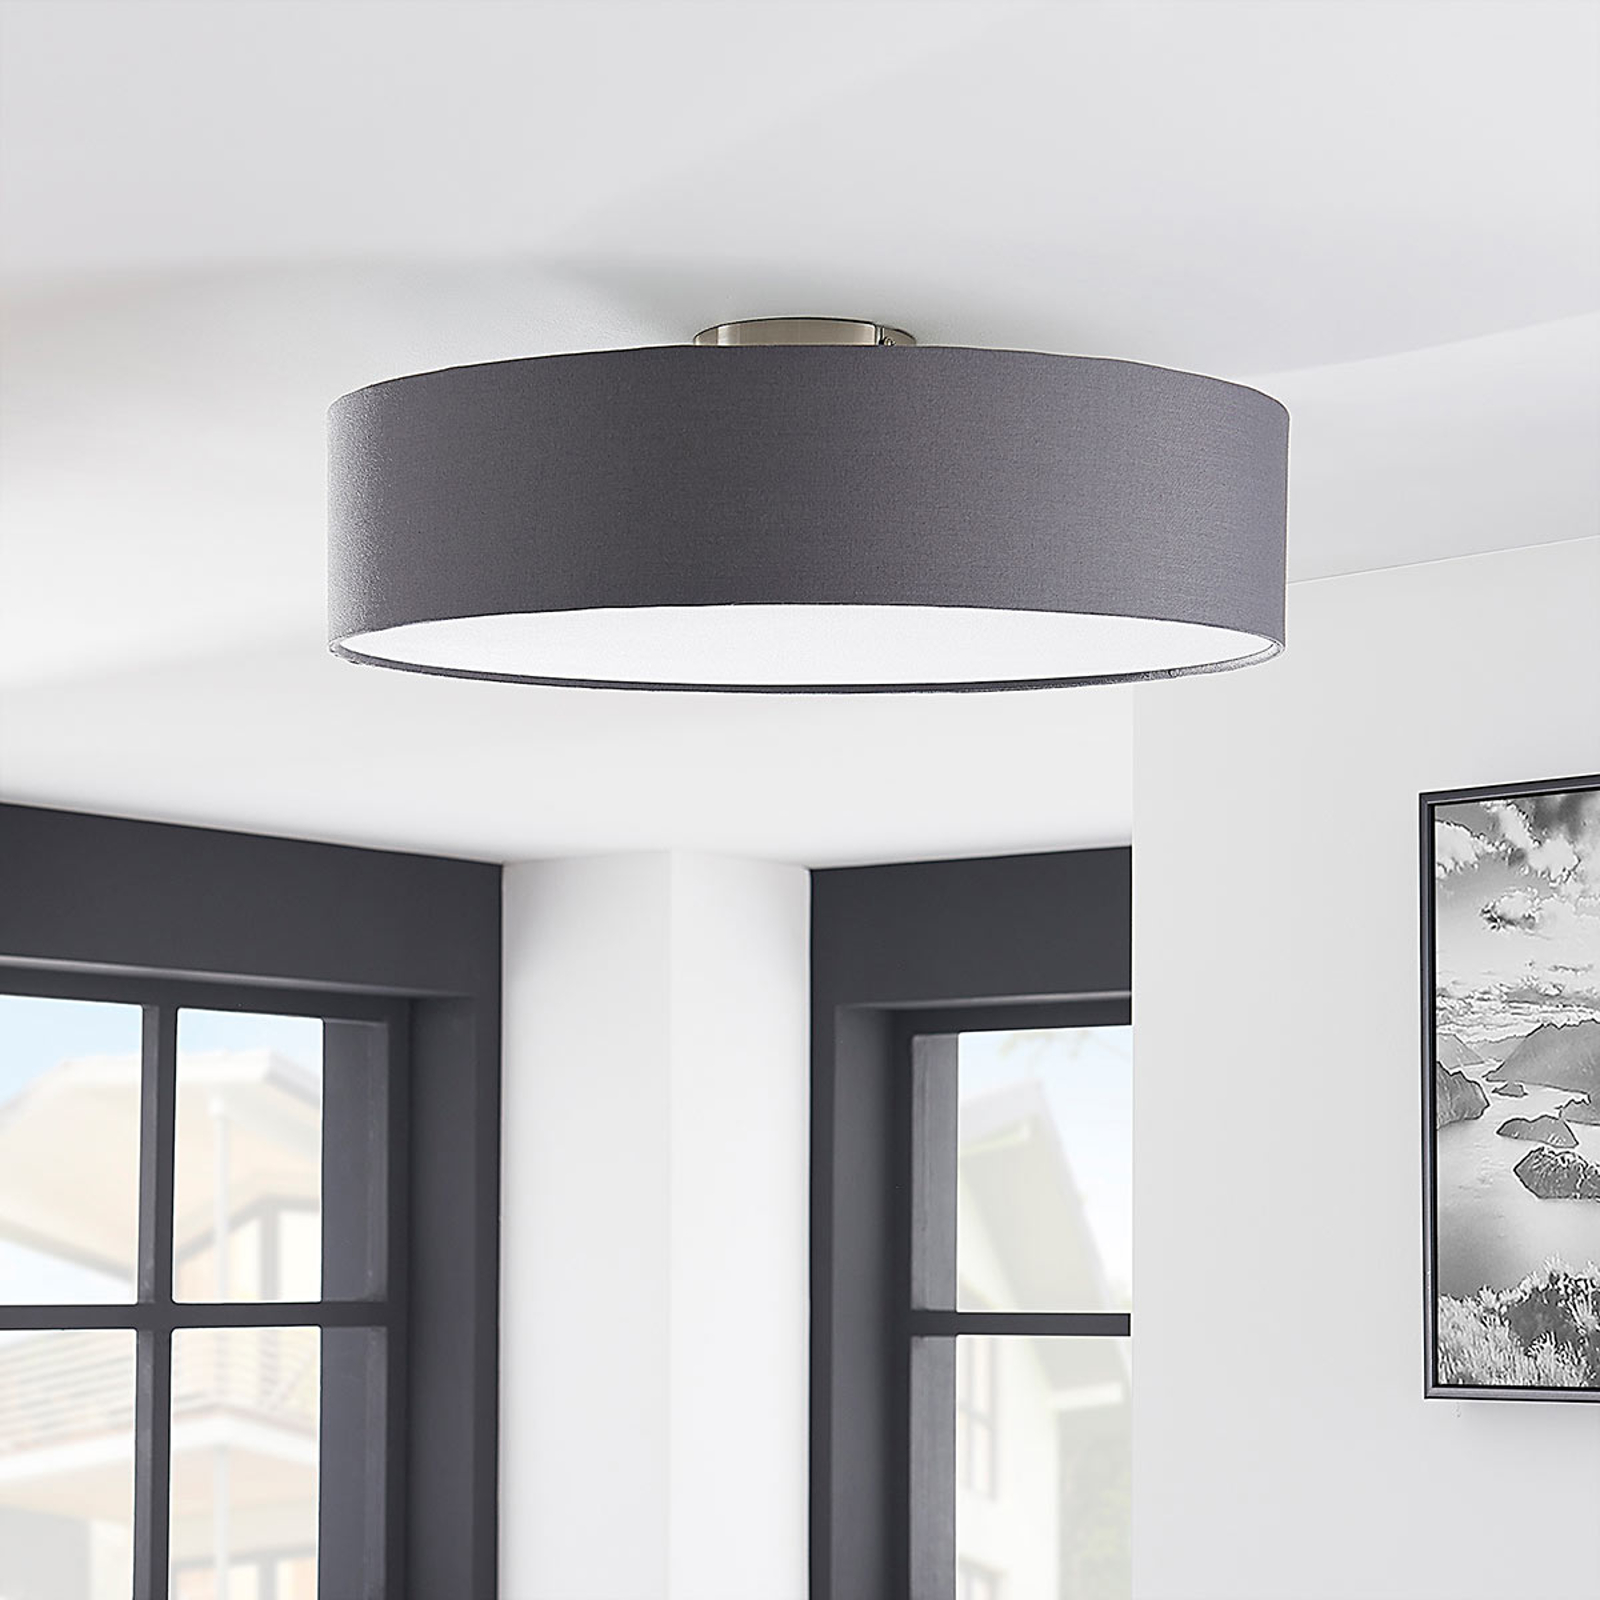 Deckenleuchte Sebatin mit E27-LED, 50 cm, grau